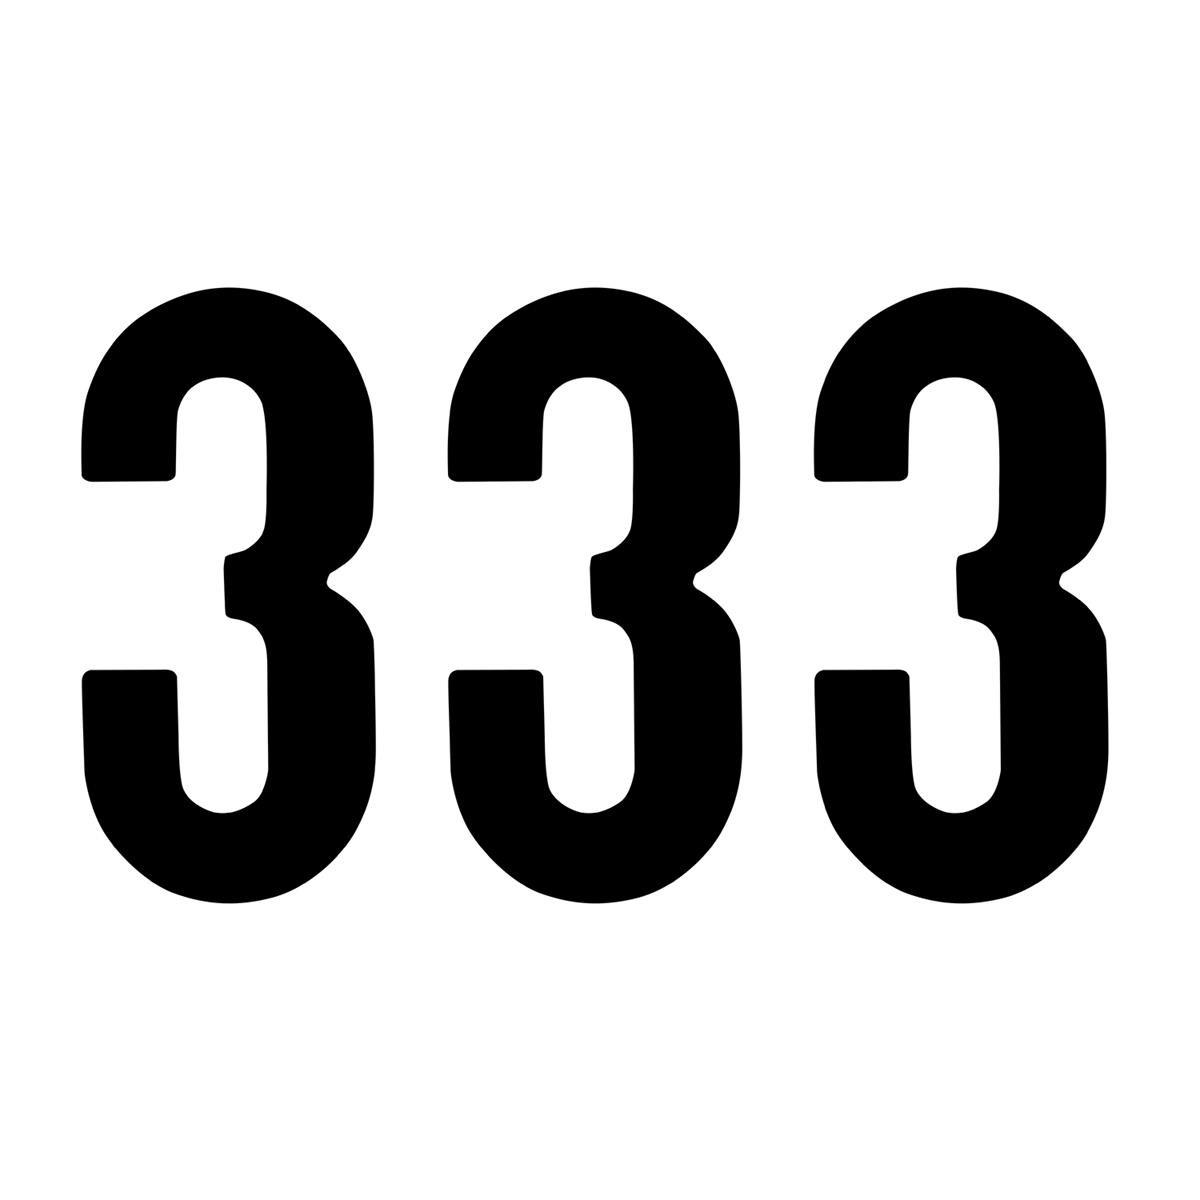 f5ef8b8100e9 ZAP Numbers Set Standard Number 3, black, 15 cm, 3 pieces | Maciag ...